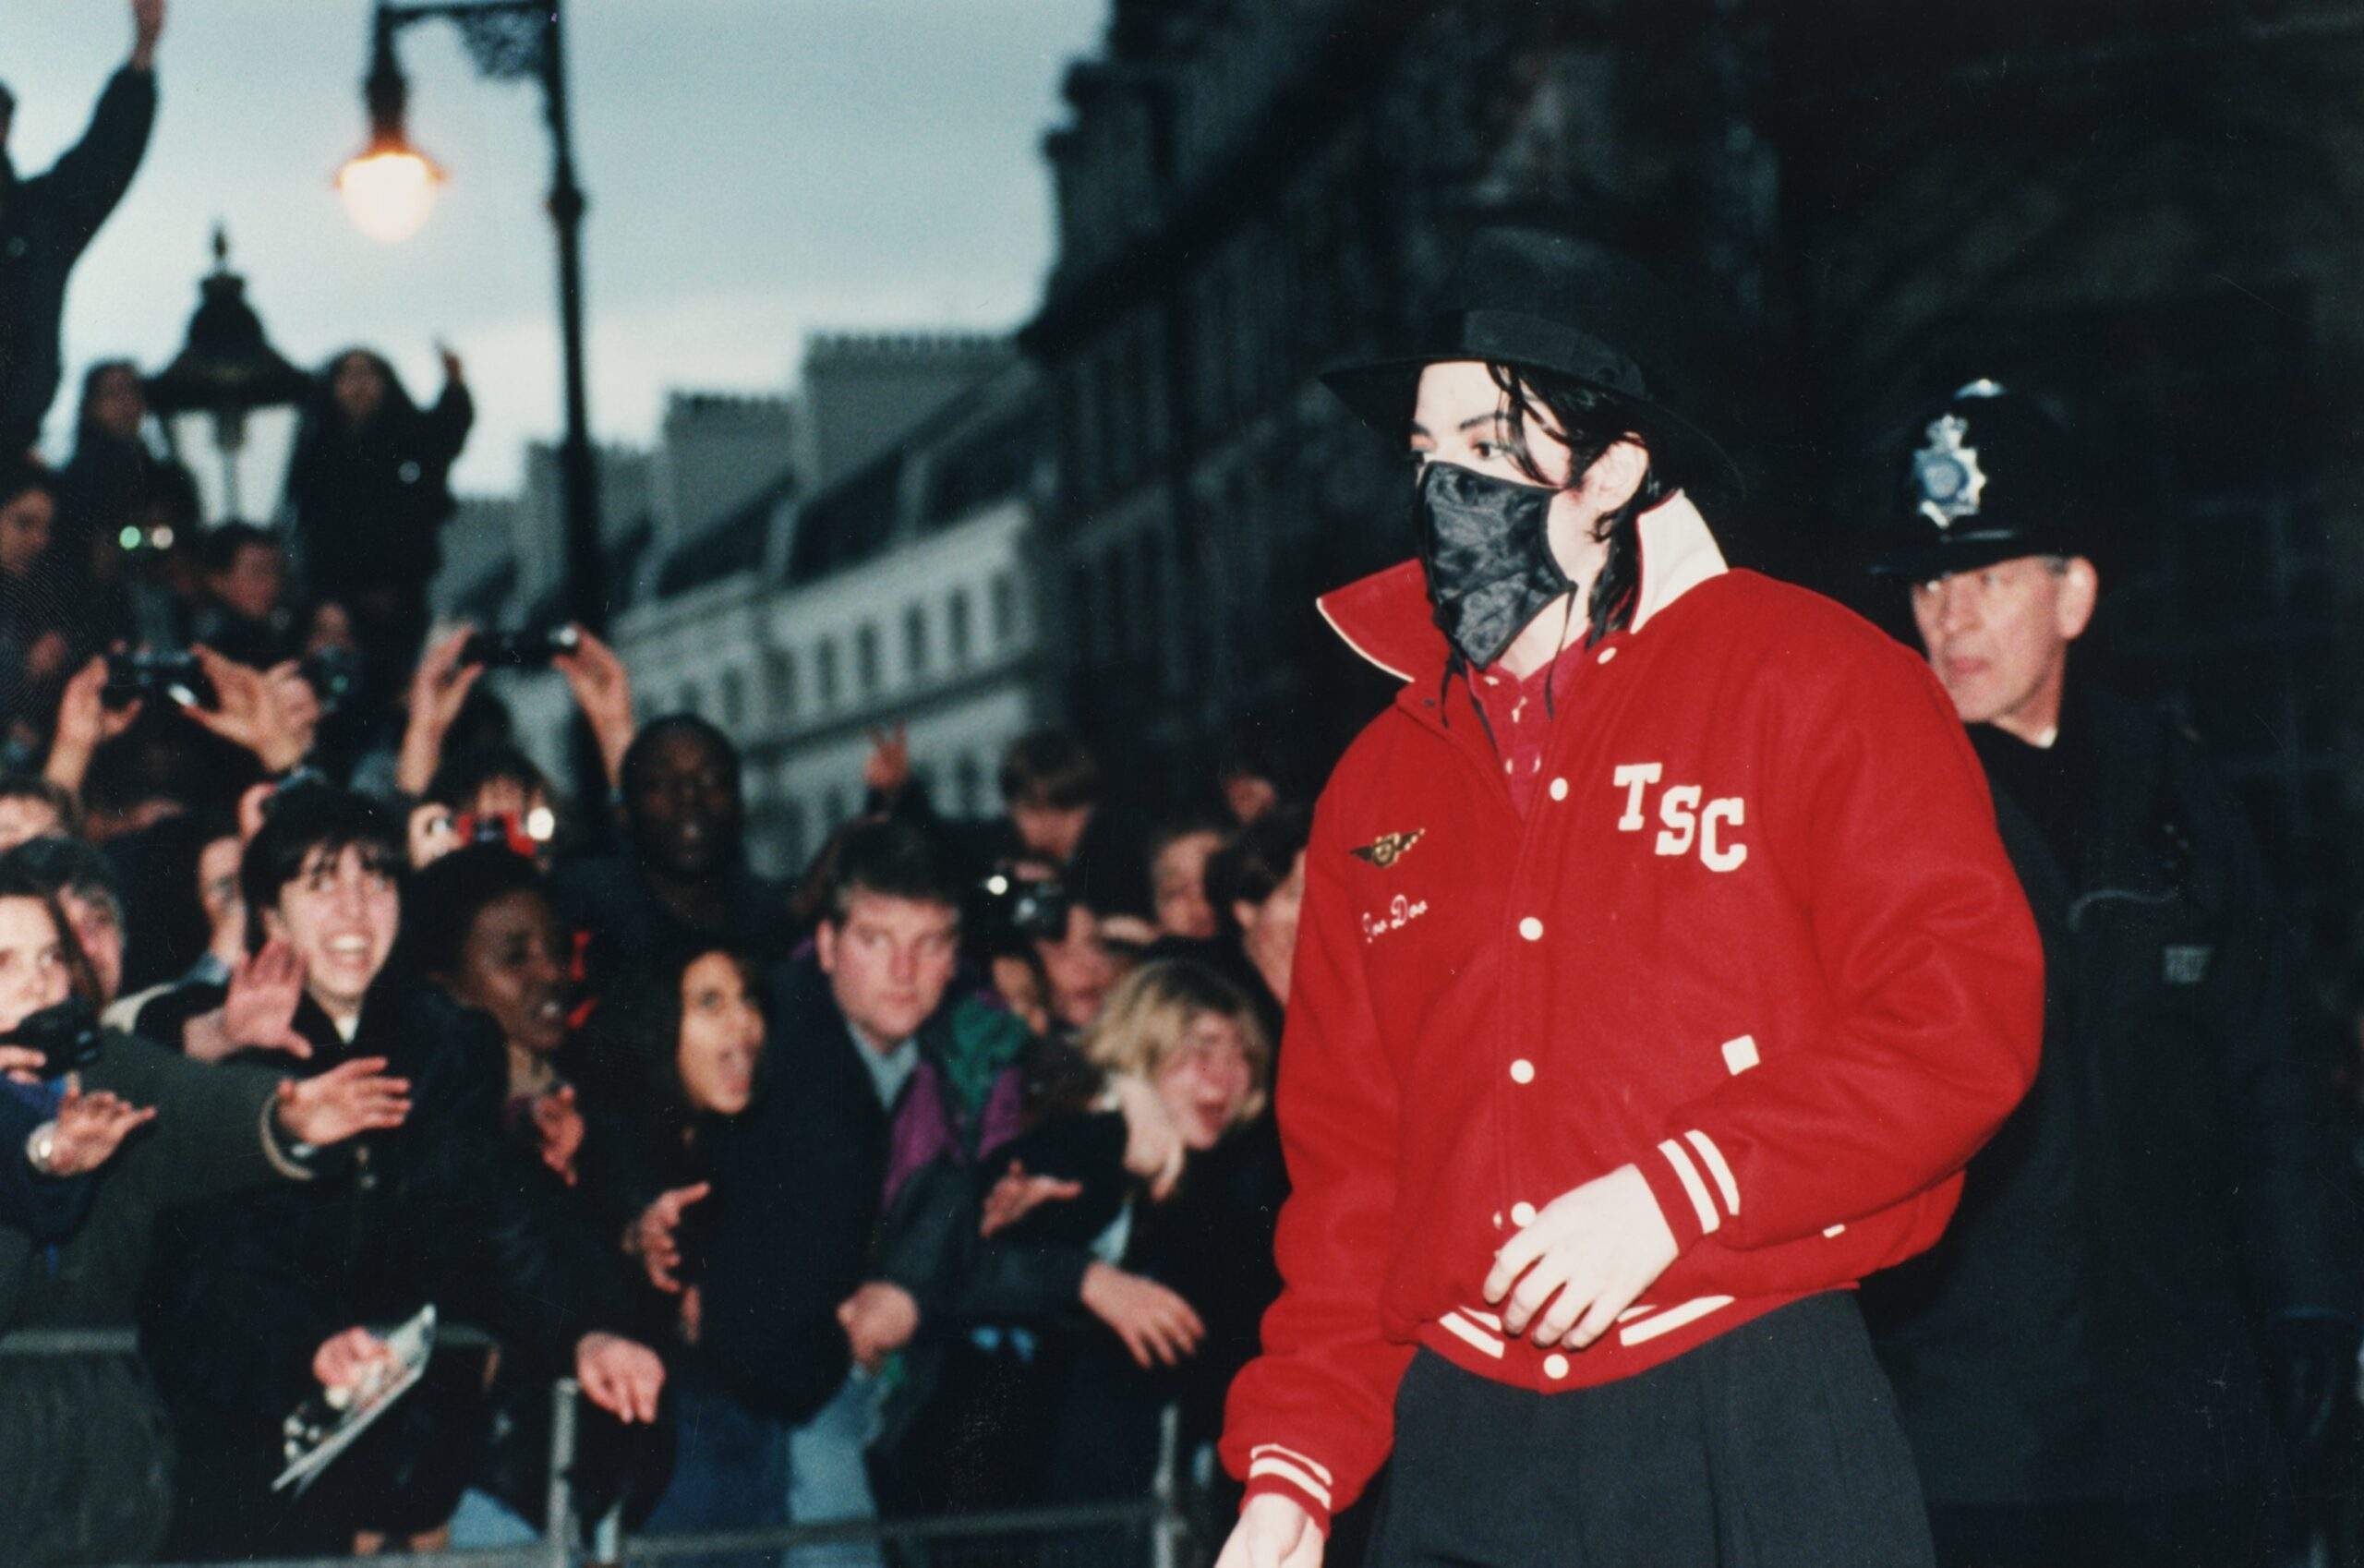 Ex-Bodyguard Says Michael Jackson Wore Face Masks Because He 'Predicted' Coronavirus